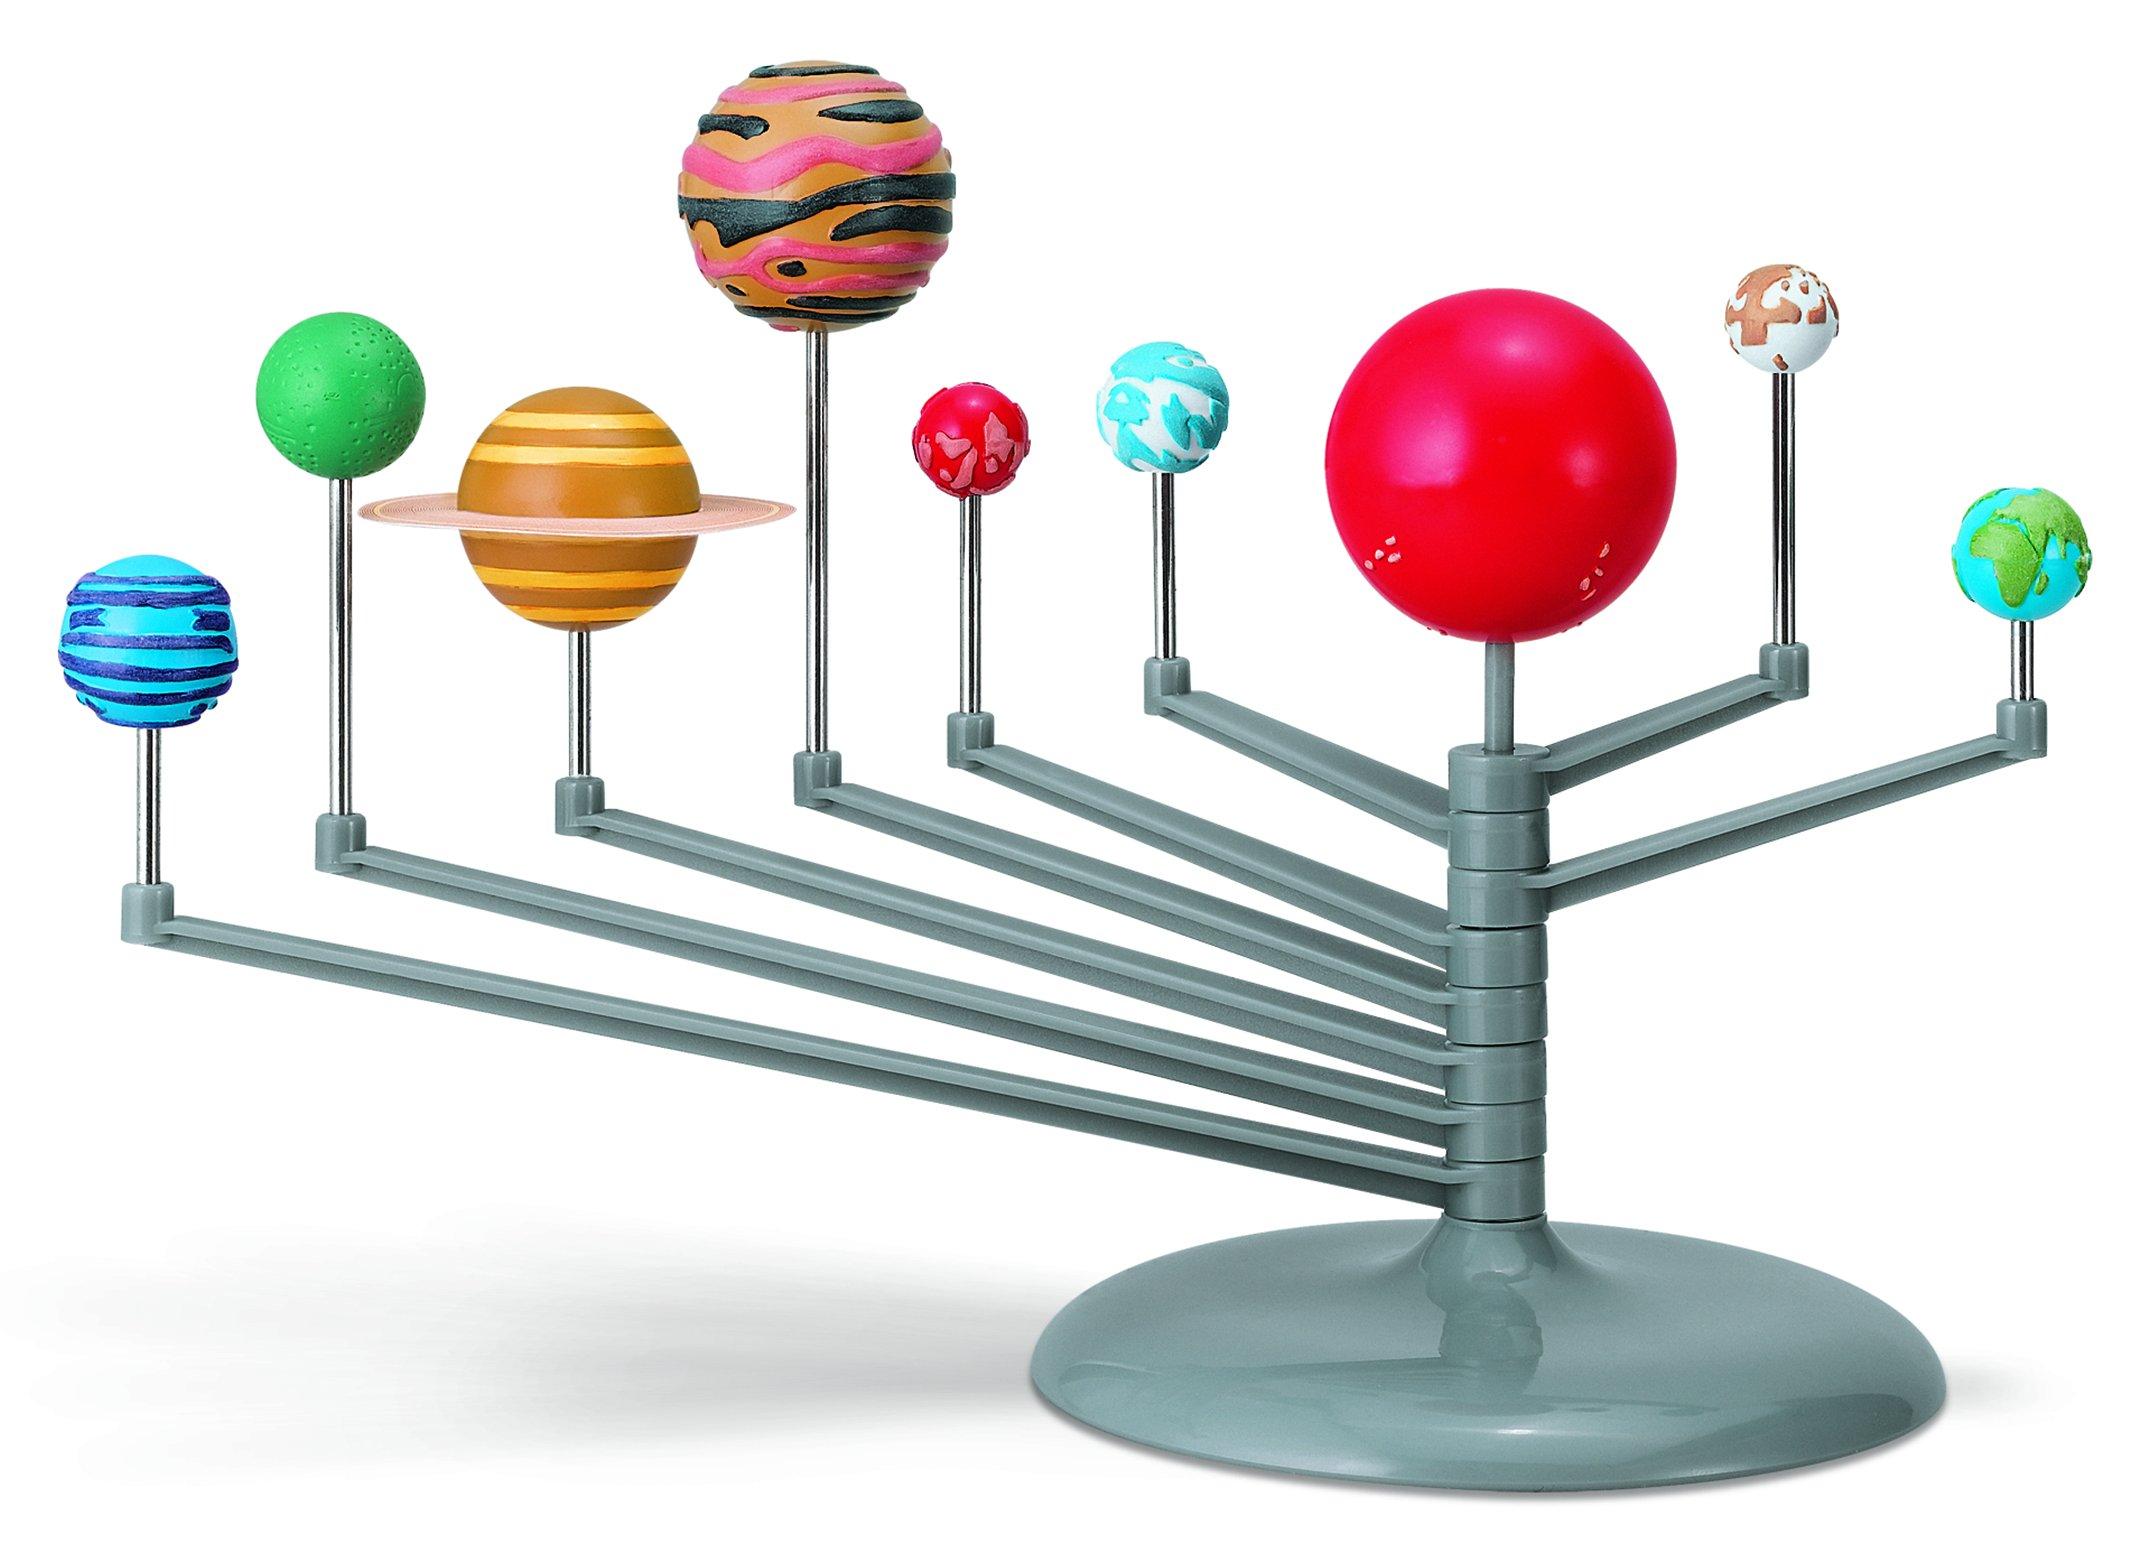 KidzLabs Planetarium Modell - Sonnensystem